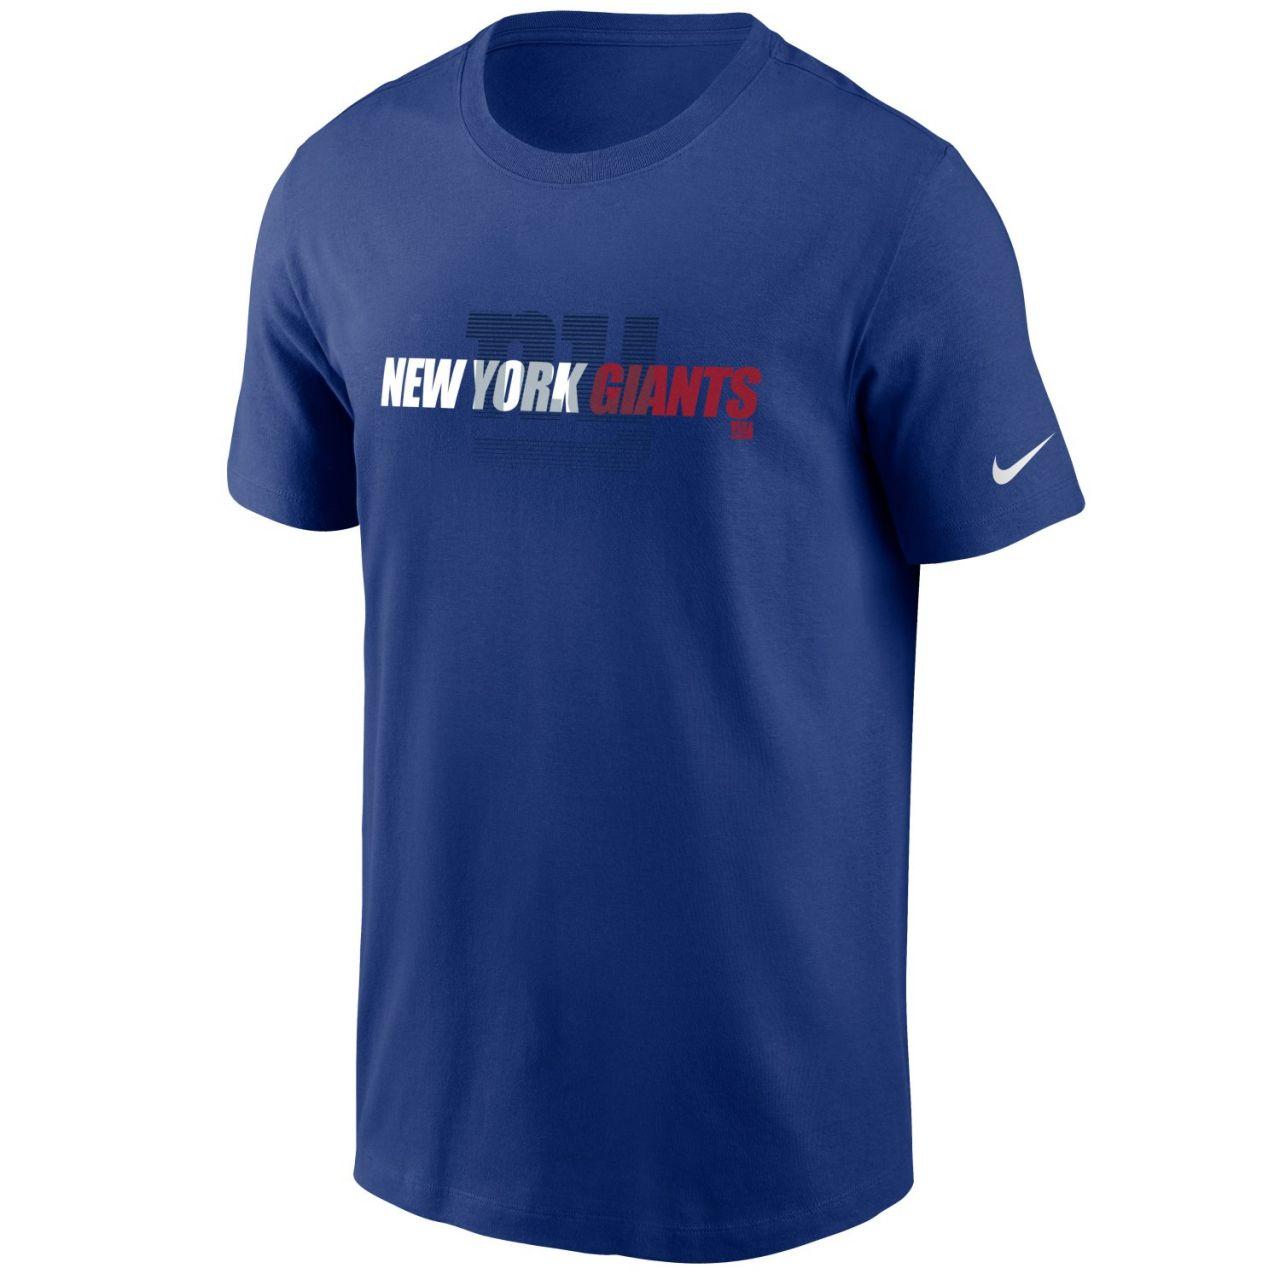 amfoo - Nike NFL Tonal Essential Shirt - New York Giants